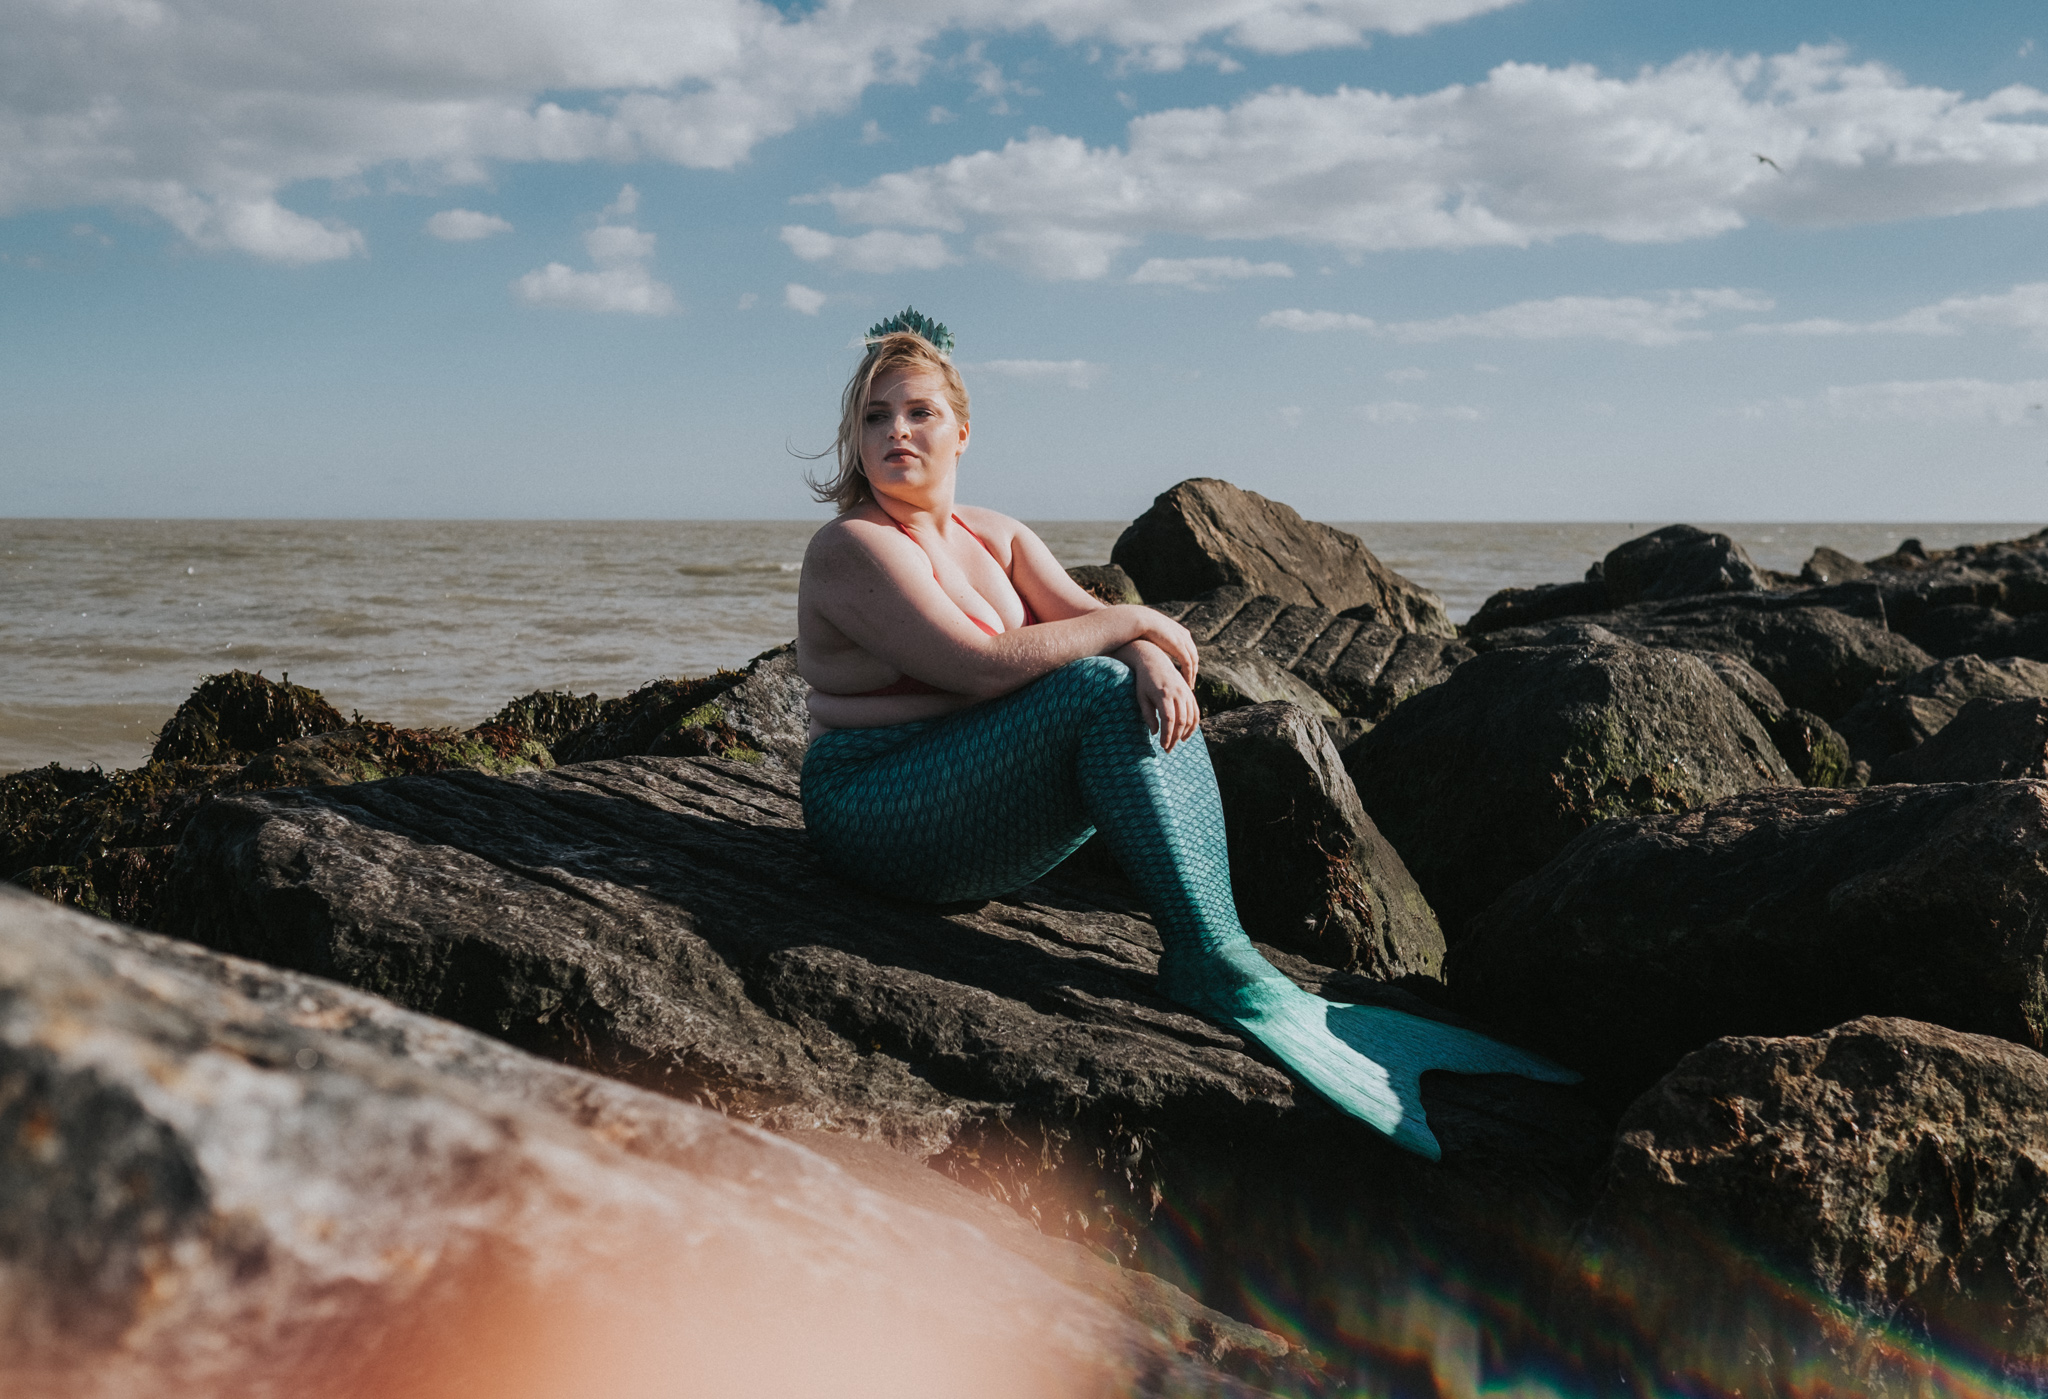 Body-Positive-Mermaids-Grace-Elizabeth-Mermaiding-UK-Alternative-Wedding-Photographer-Colchester-Essex-Suffolk-Norfolk-Devon (44 of 59).jpg